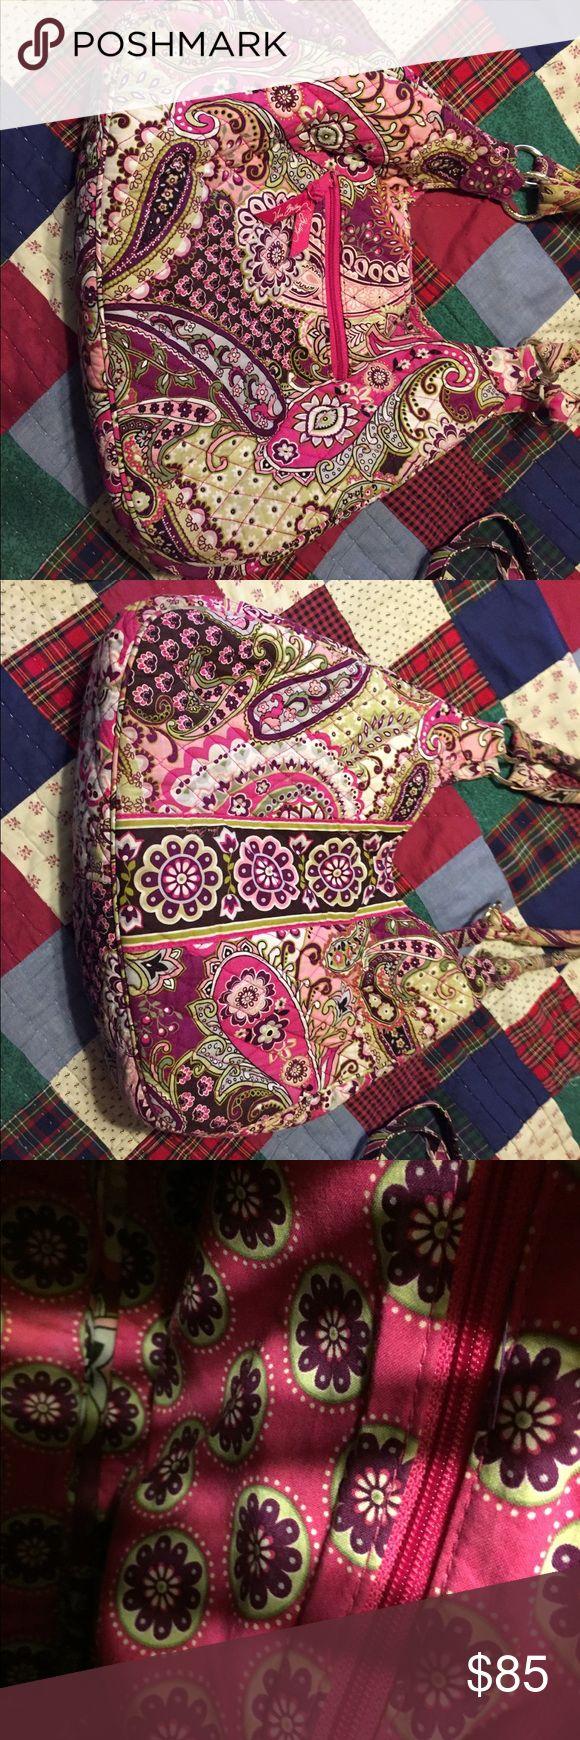 Vera Bradley large bag Very Berry Paisley, Pink flower